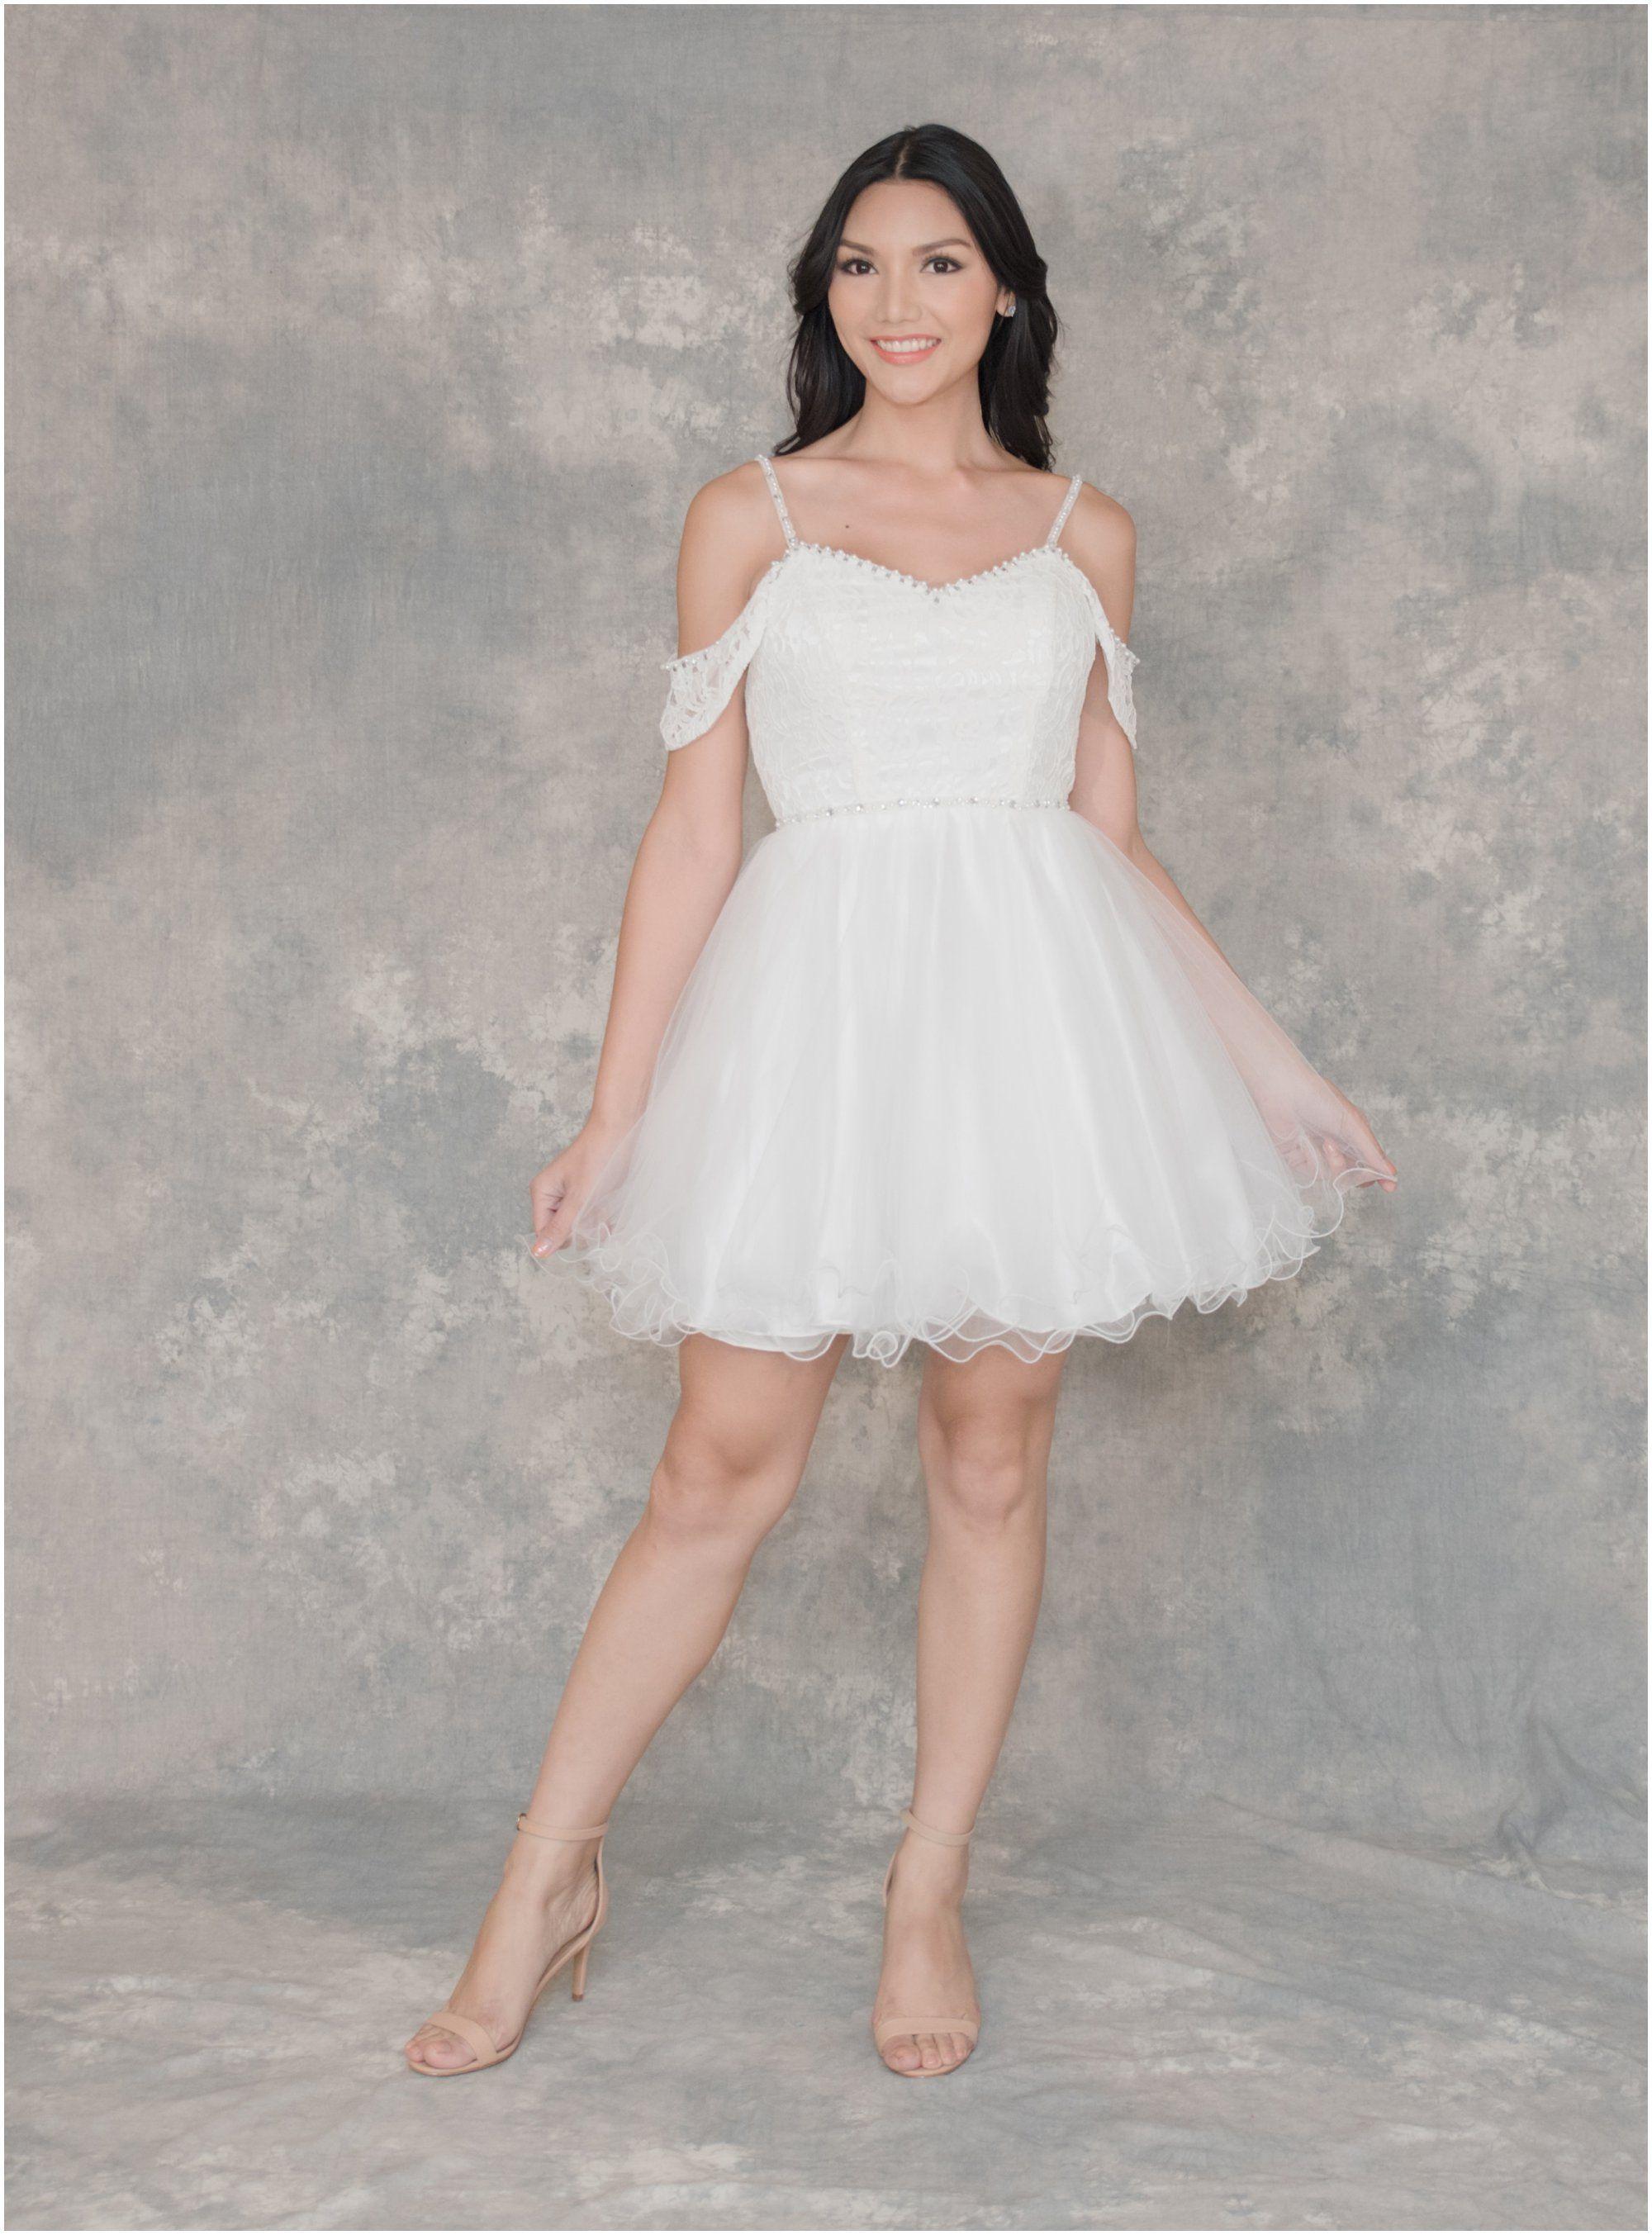 Rent A Dress Las Vegas Rent A Dress Formal Dress Military Ball Dress Ideas Prom Dre Casual Wedding Dress Short Wedding Dress Wedding Dresses Unique [ 2706 x 2000 Pixel ]